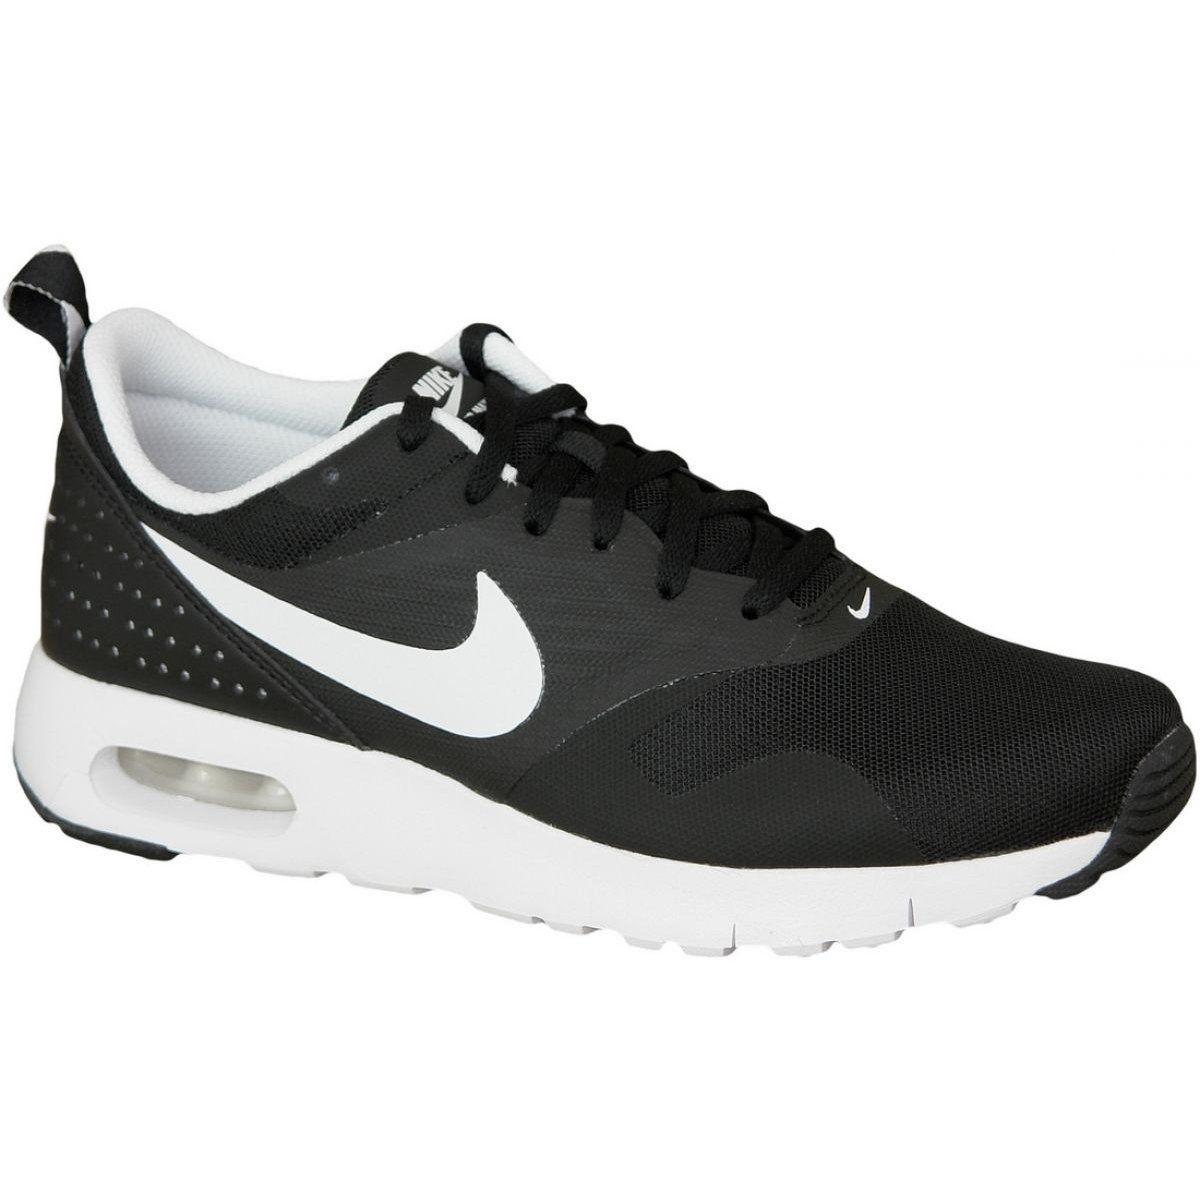 Buty Nike Air Max Tavas Gs W 814443 001 Czarne Nike Air Max Nike Nike Shoes Women